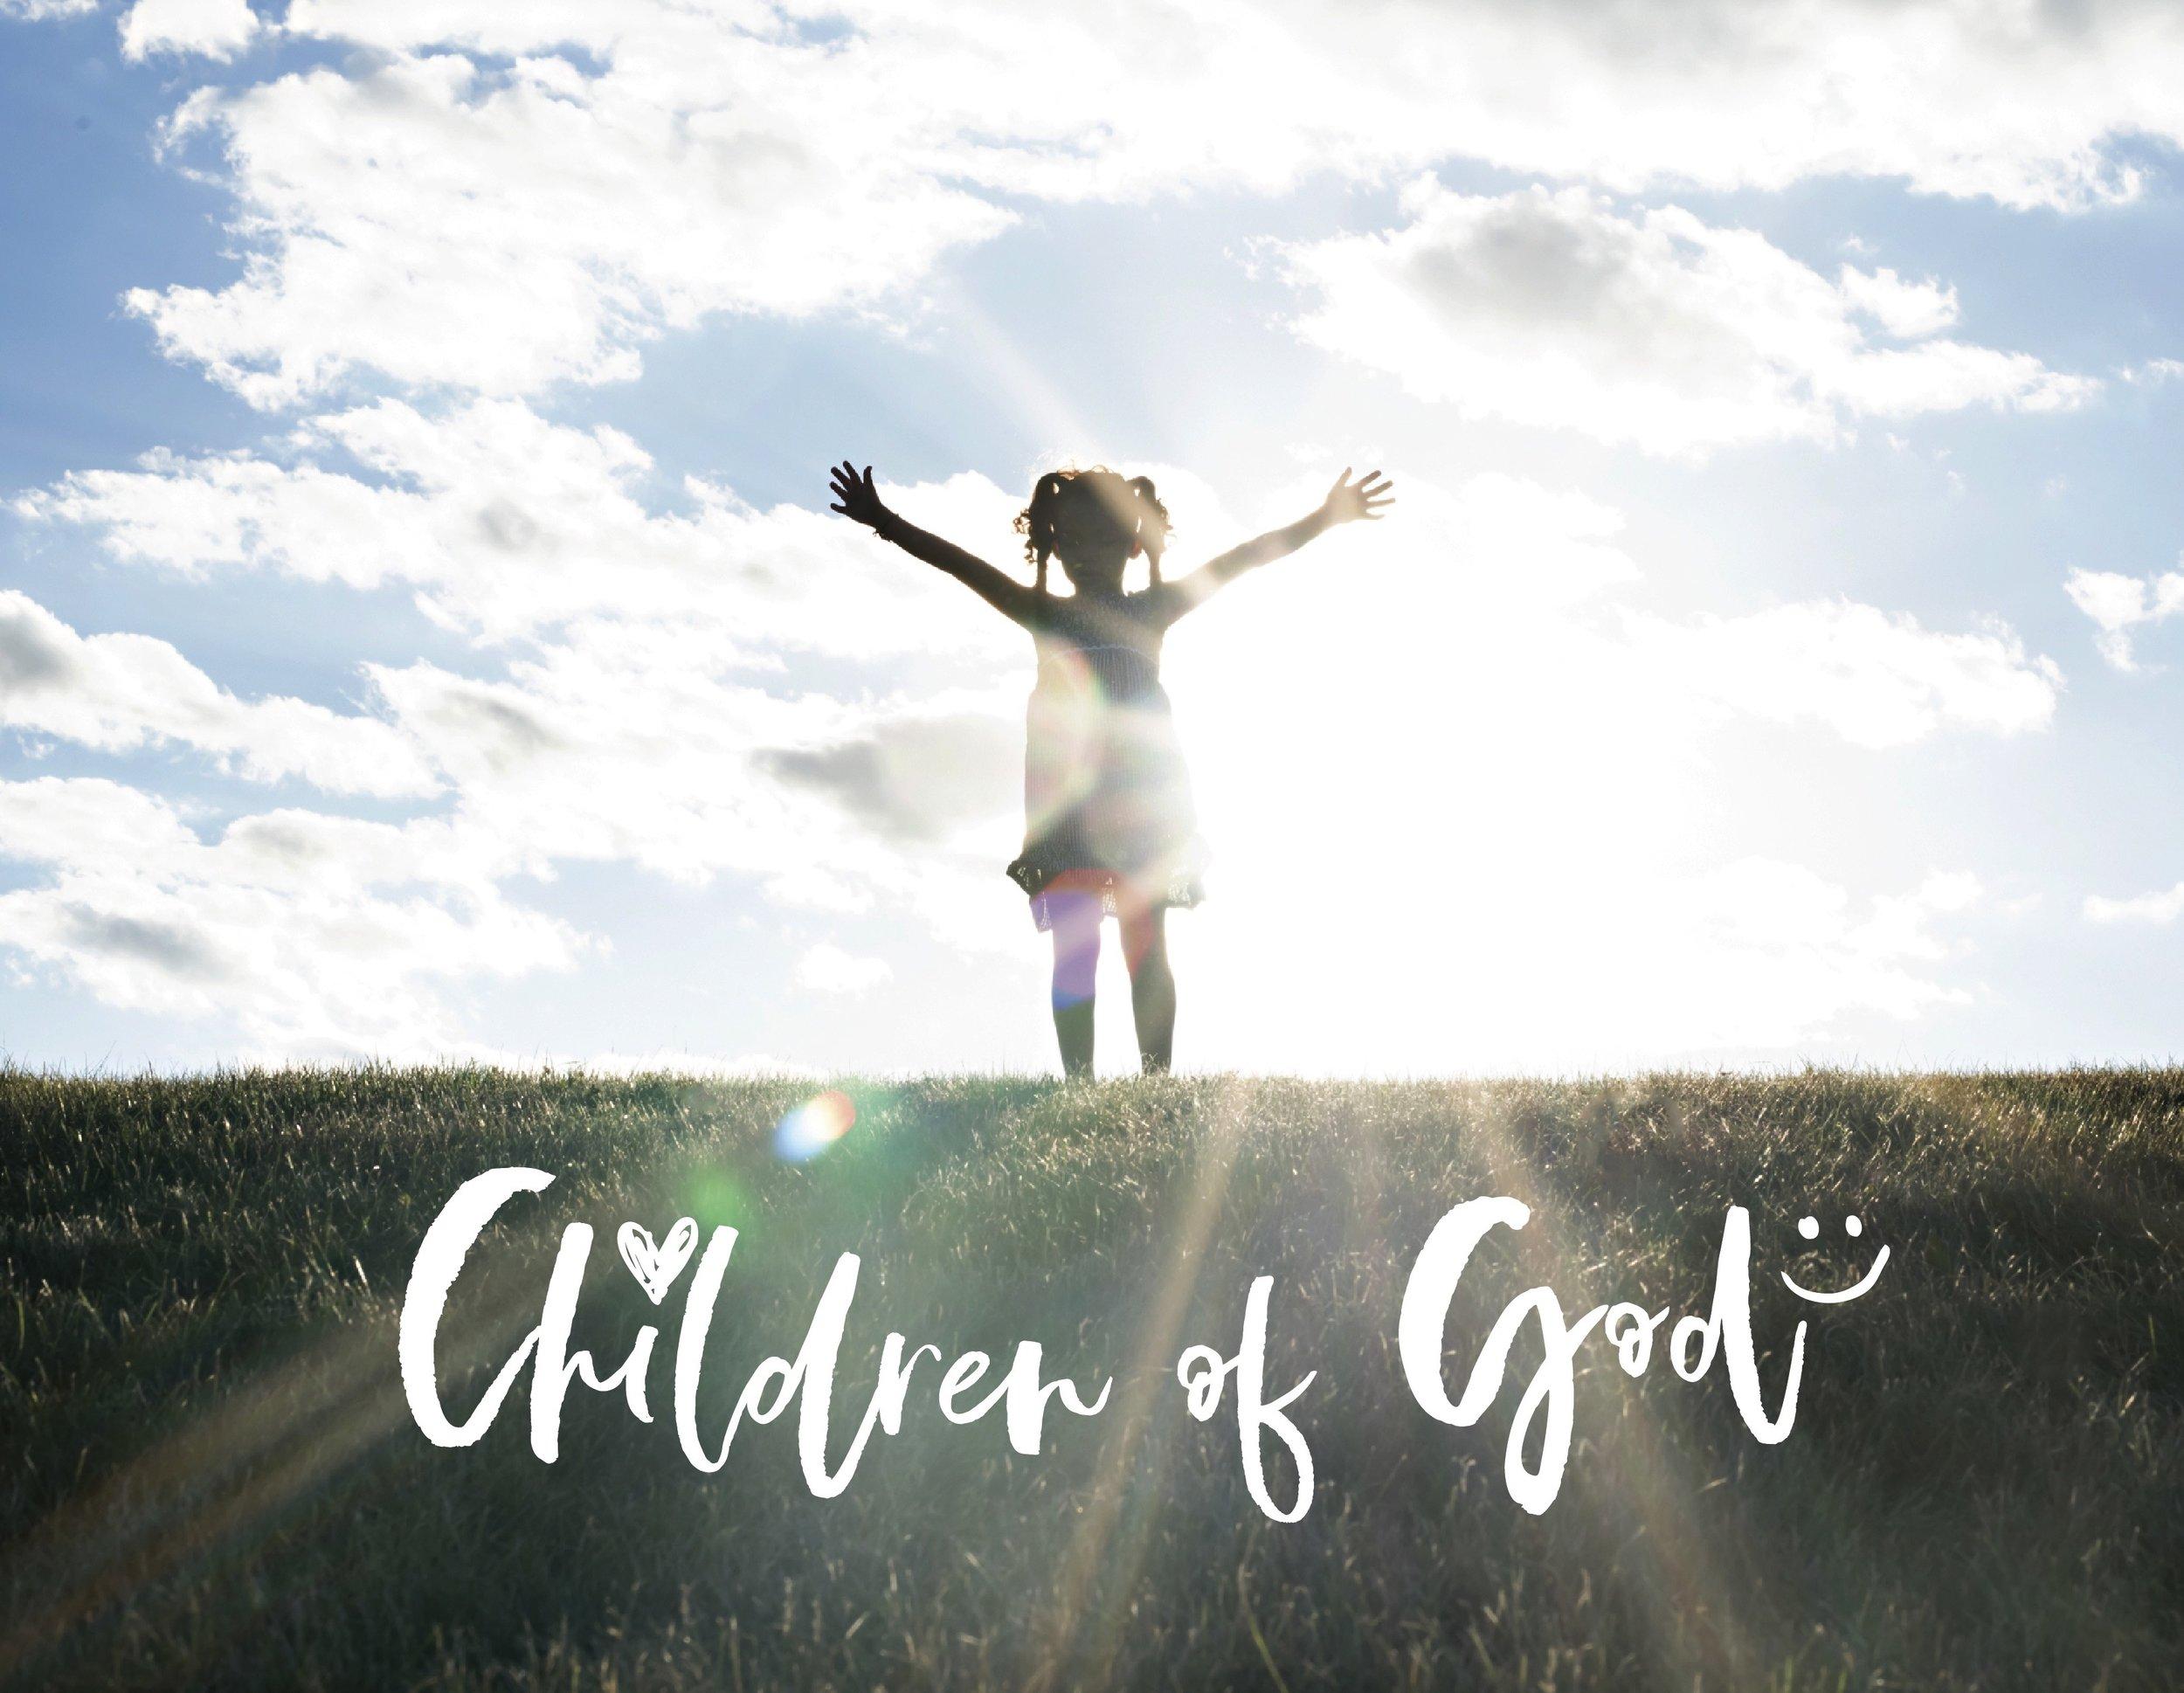 Children of God_2018 National Adoption Sunday.jpg